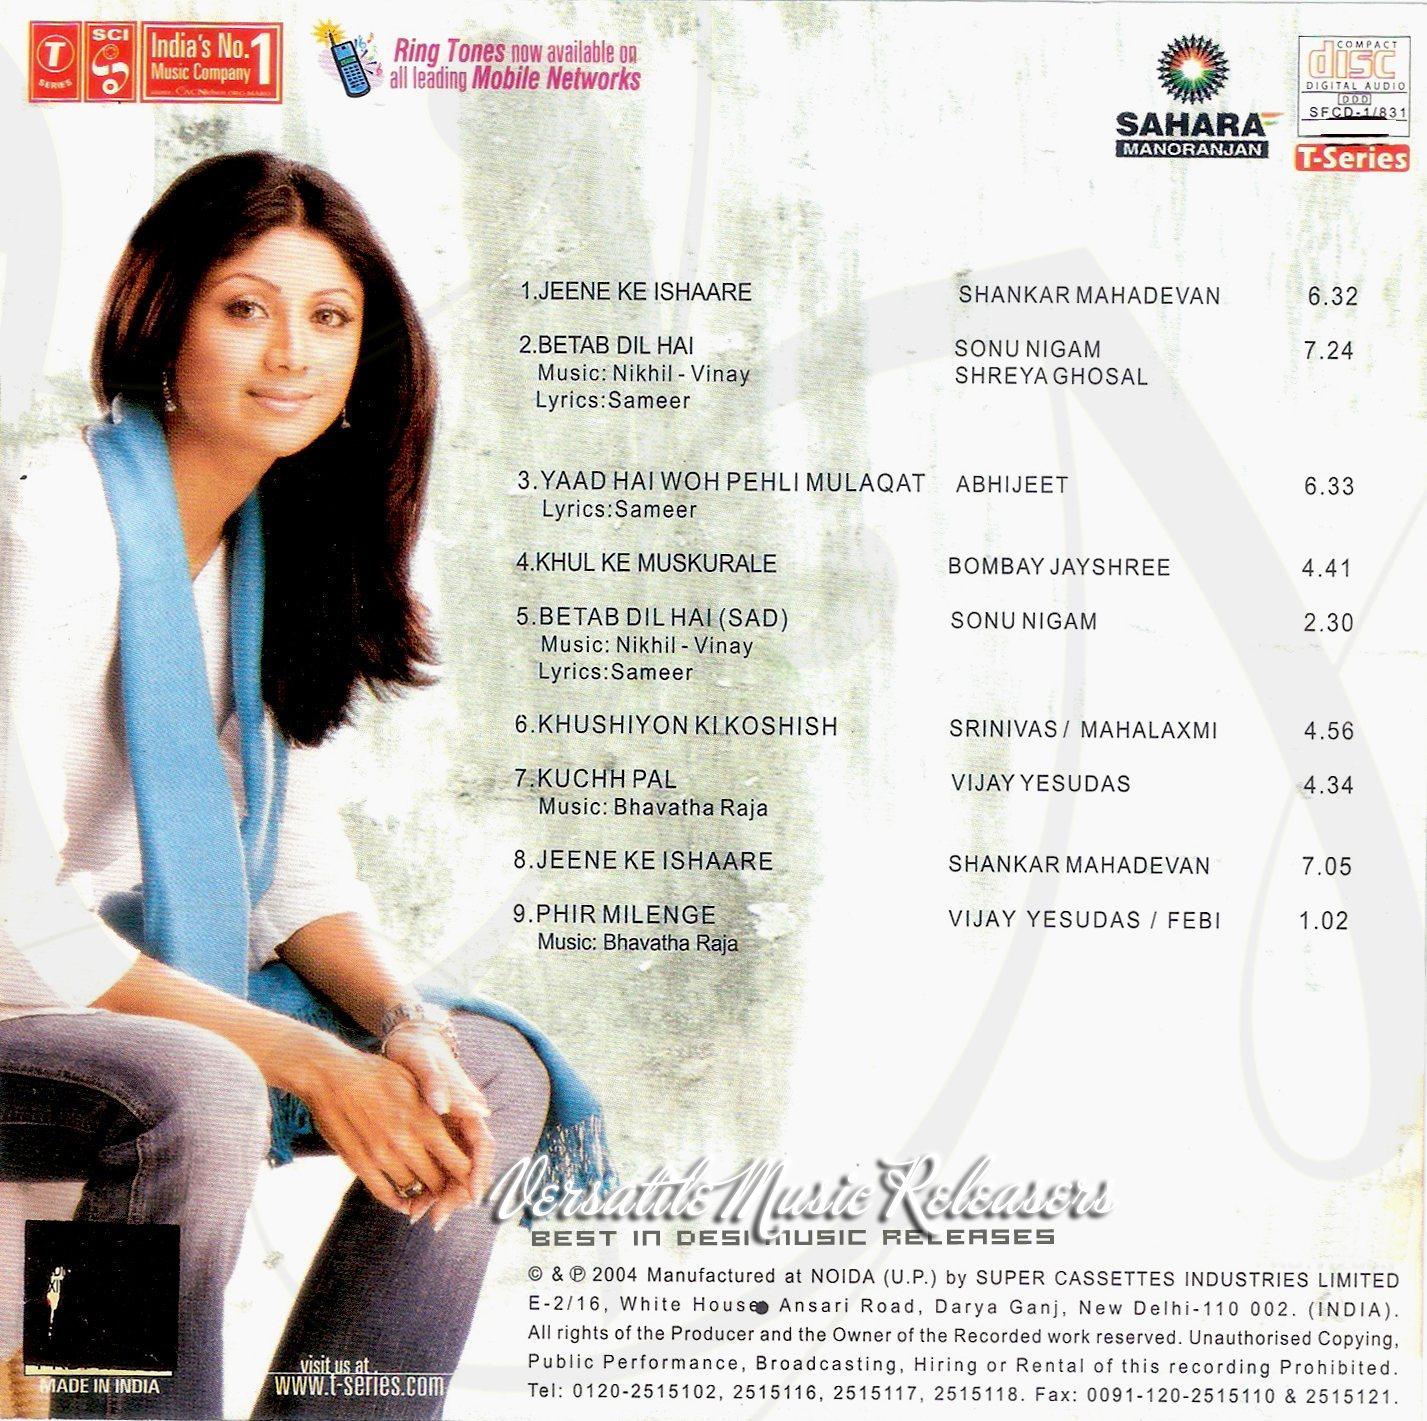 Pehli Mulaqaat By Rohan Preet Mp3 Download: THE HOME OF SHREYA GHOSHAL SONGS: Phir Milenge [2004-MP3